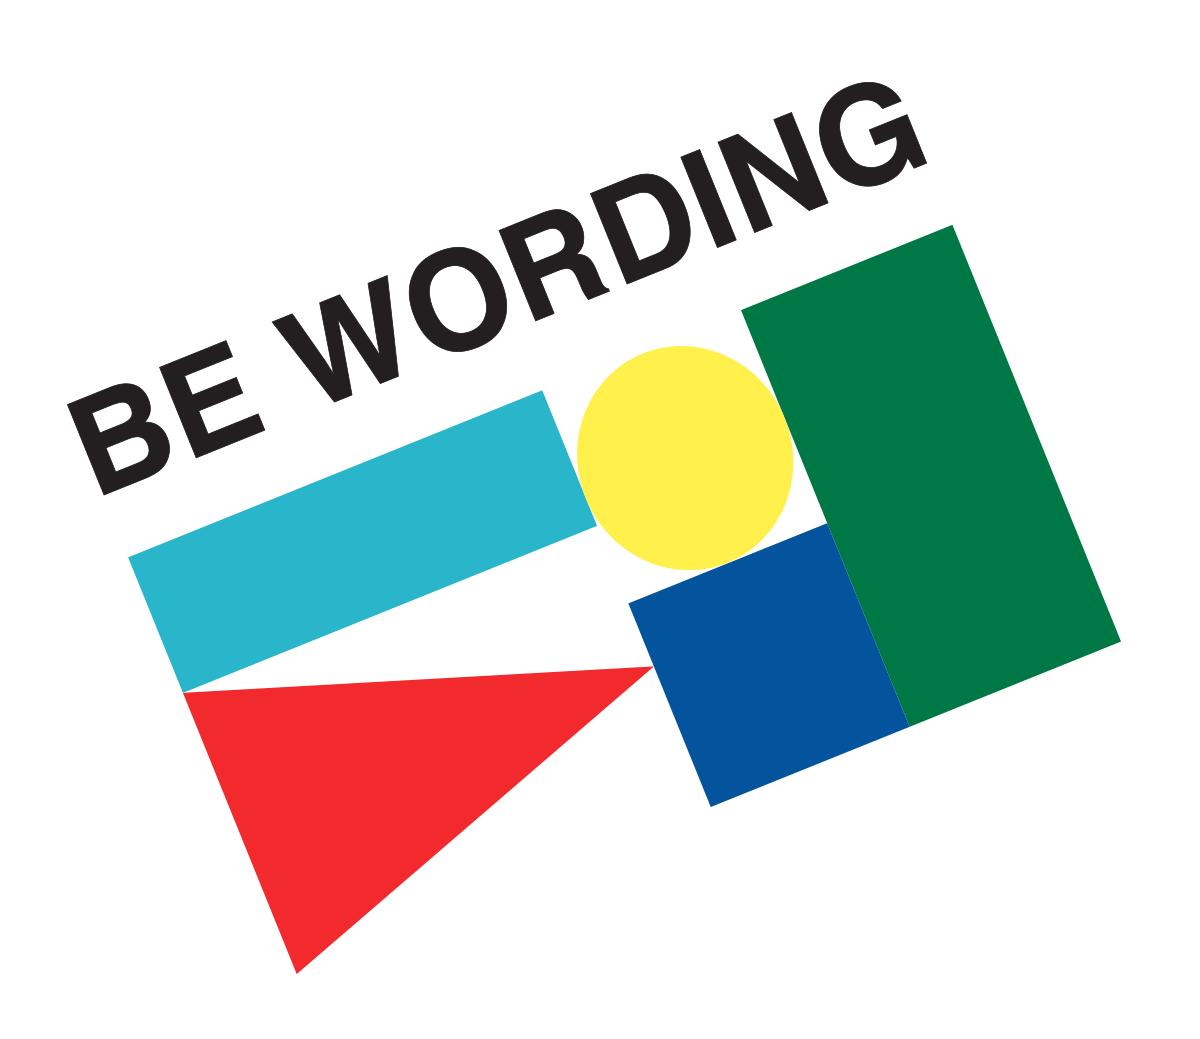 Be Wording